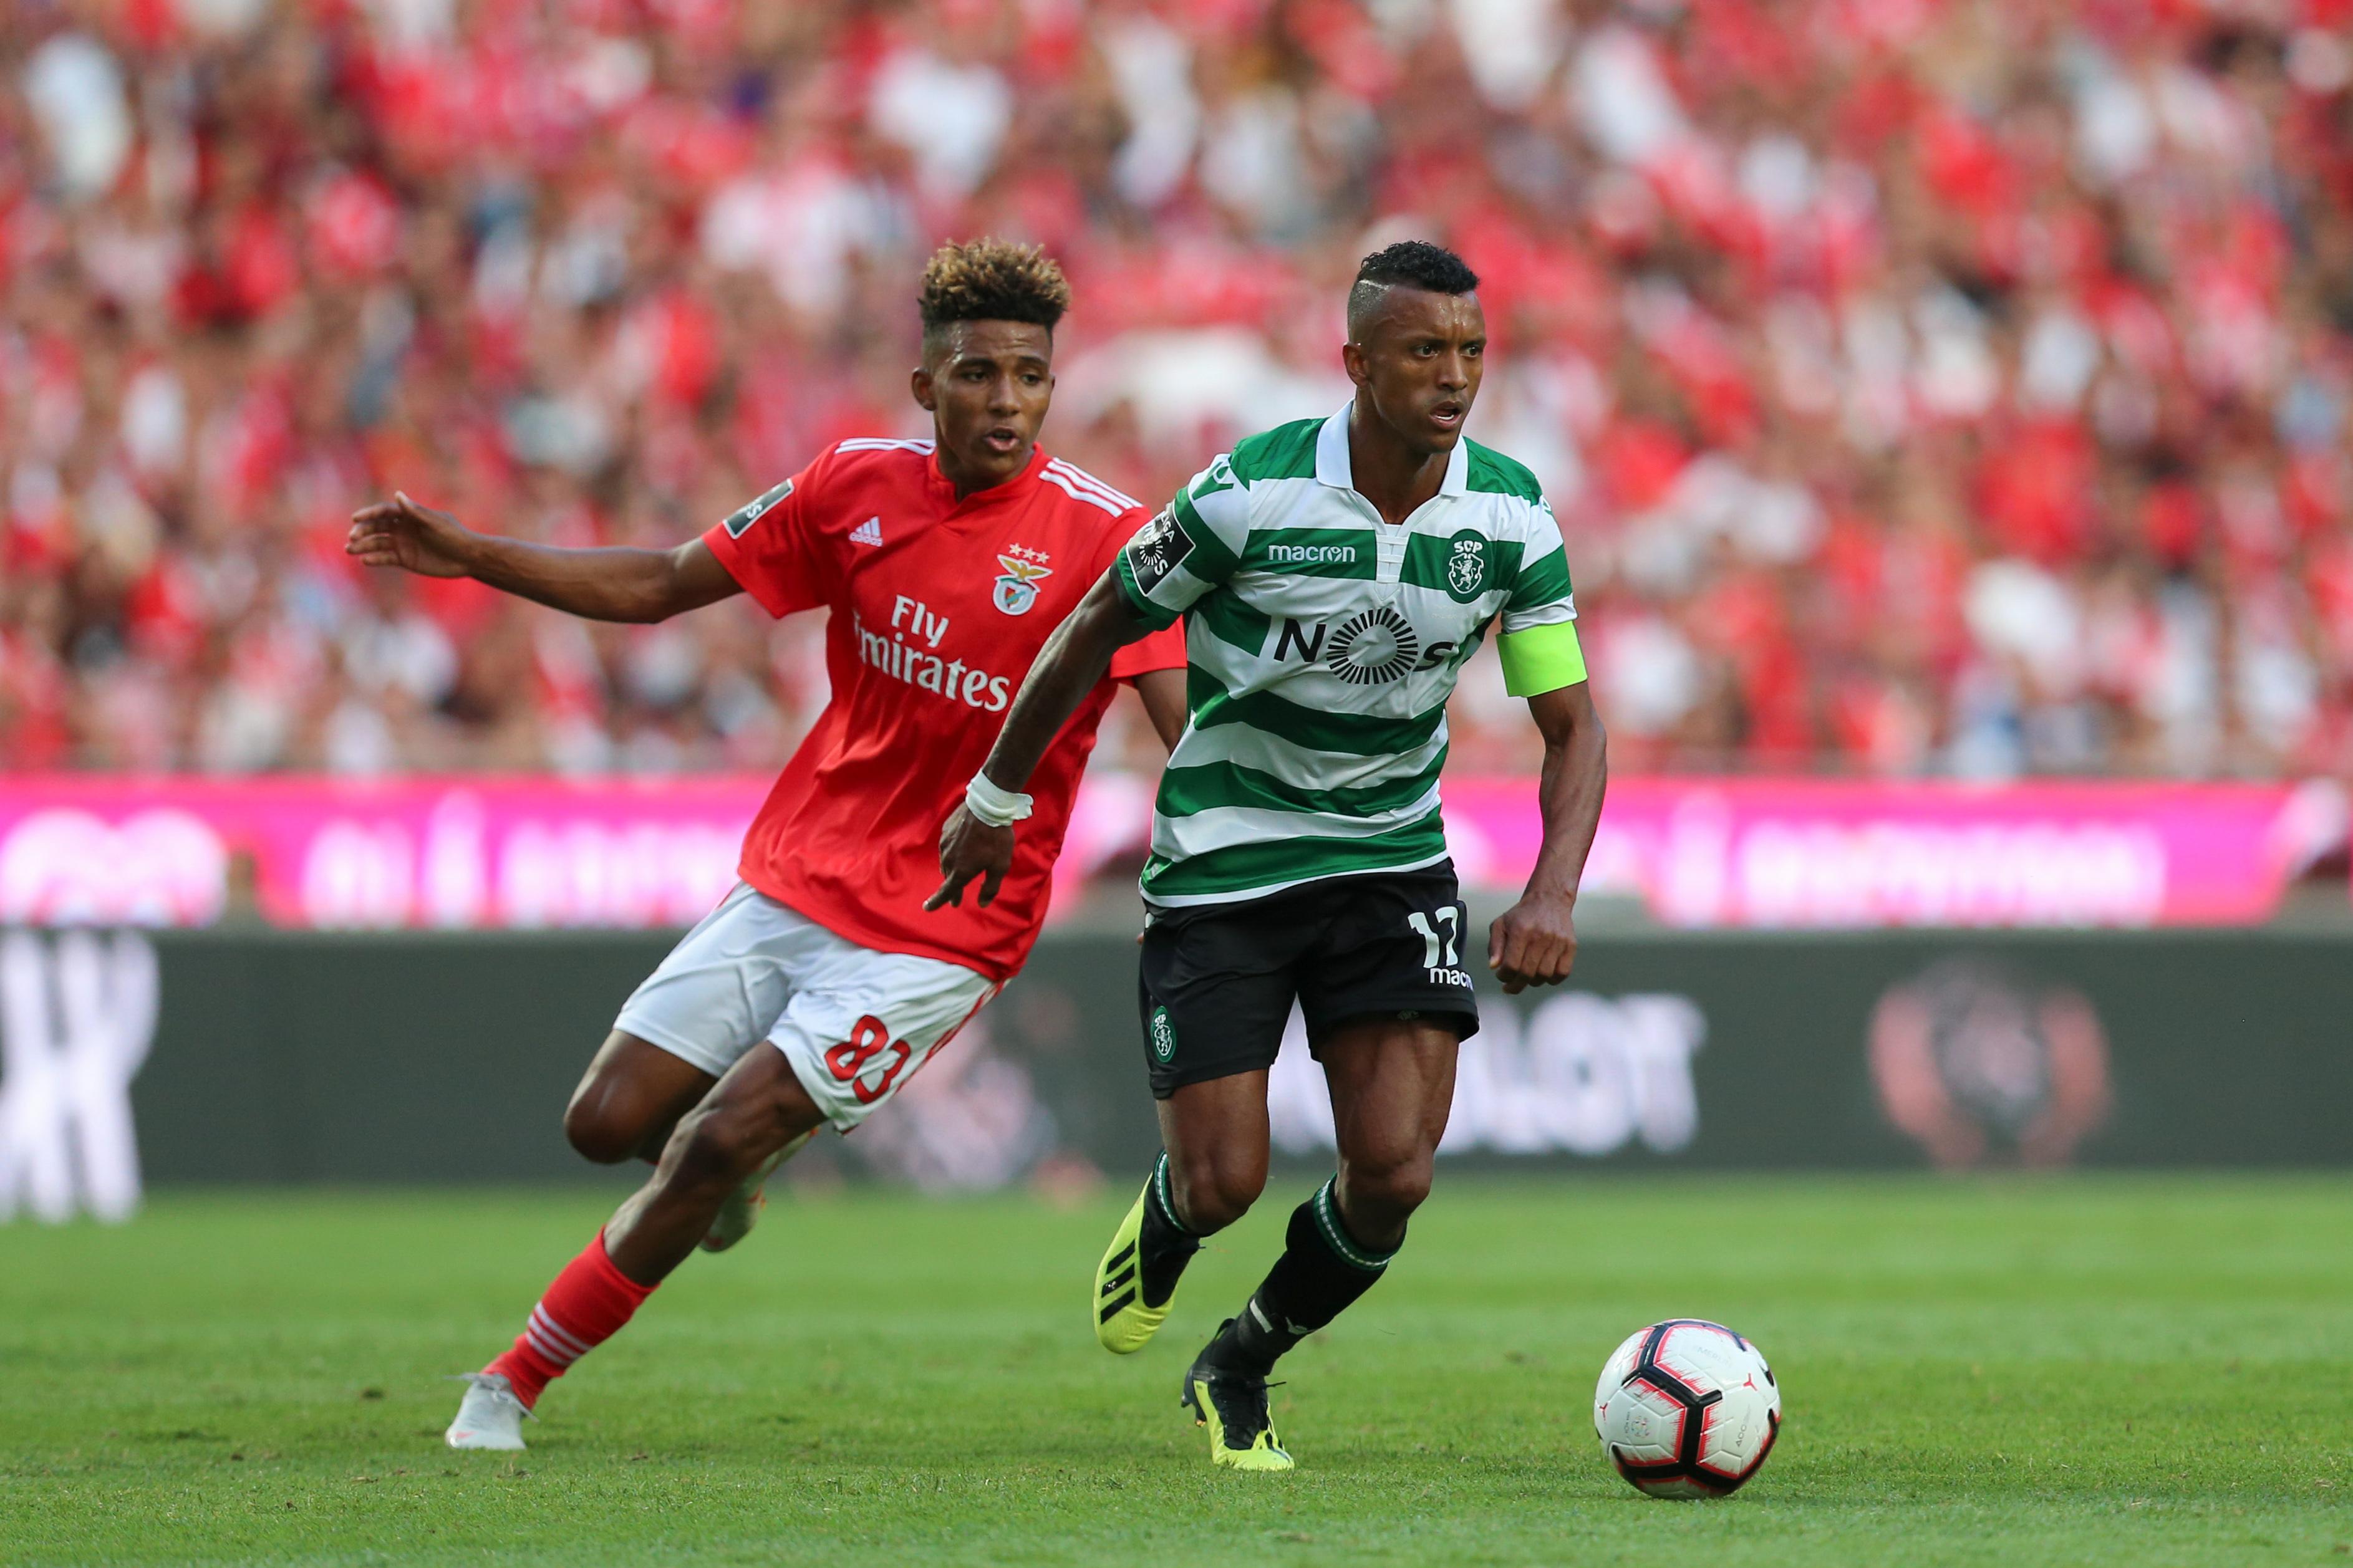 LE: Benfica perfeito nos 16 avos de final, Sporting com 50% de aproveitamento